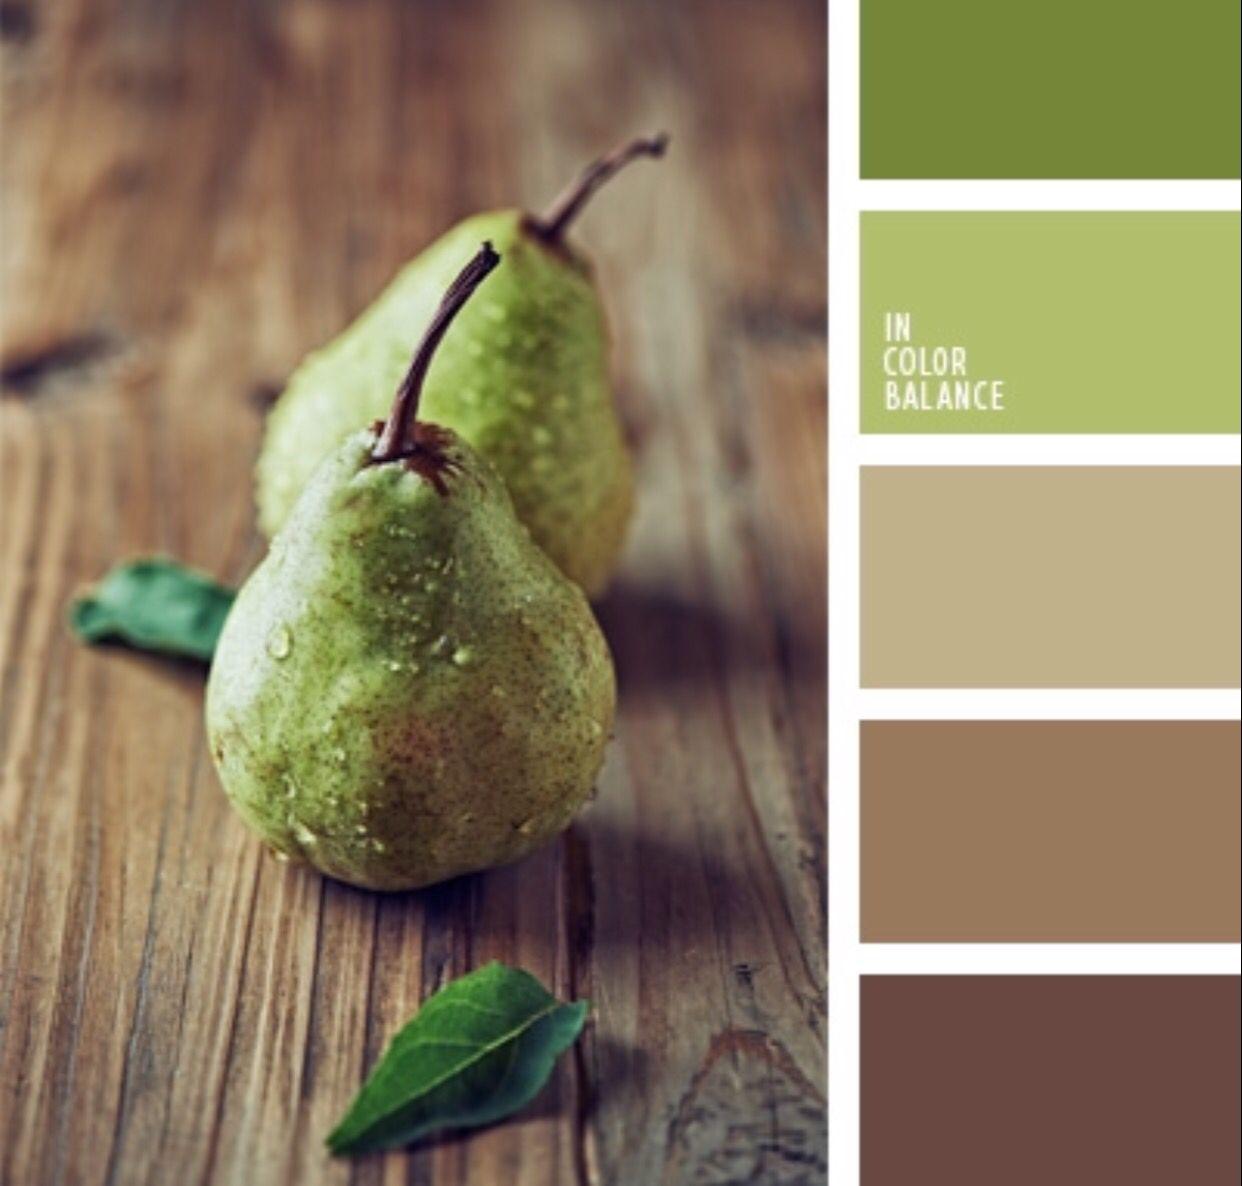 картинки в зелено-коричневом цвете своим